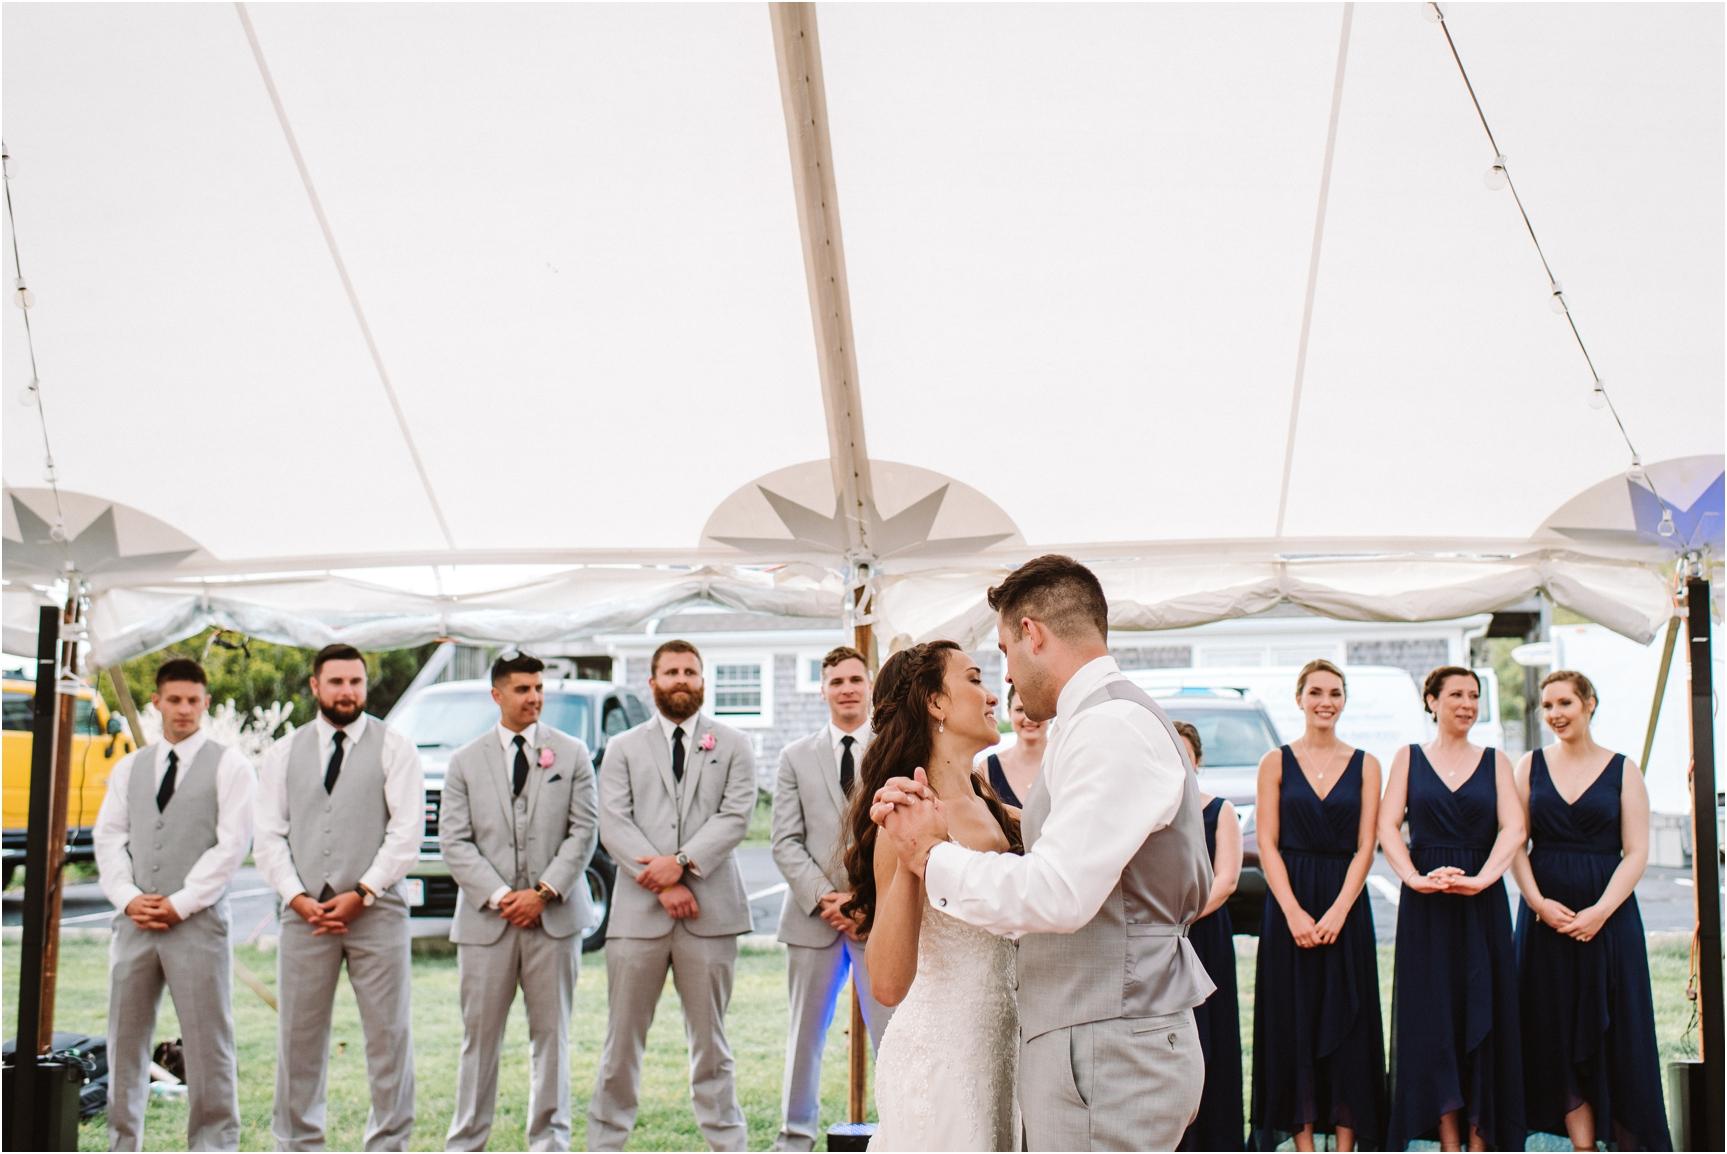 Sarah & Sam Pelham House Cape Cod Wedding Photographer-154.jpg